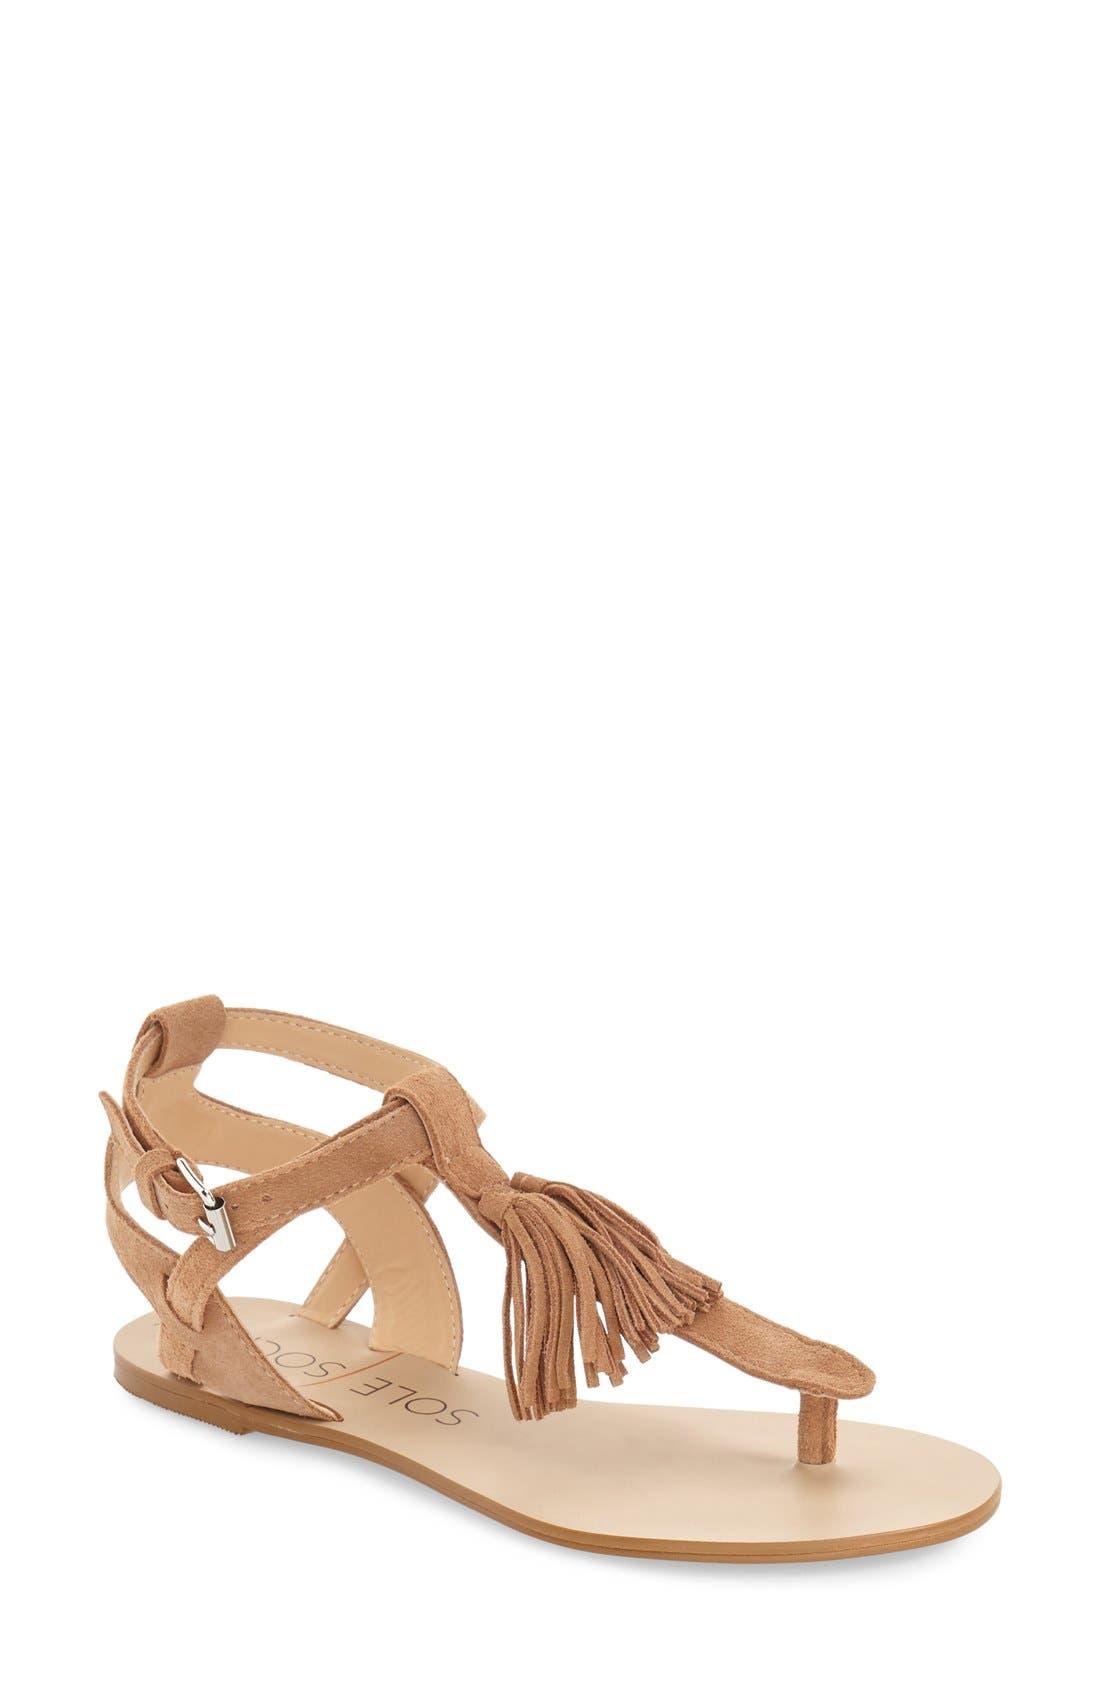 'Pandora' Fringe Sandal,                         Main,                         color, Caramel